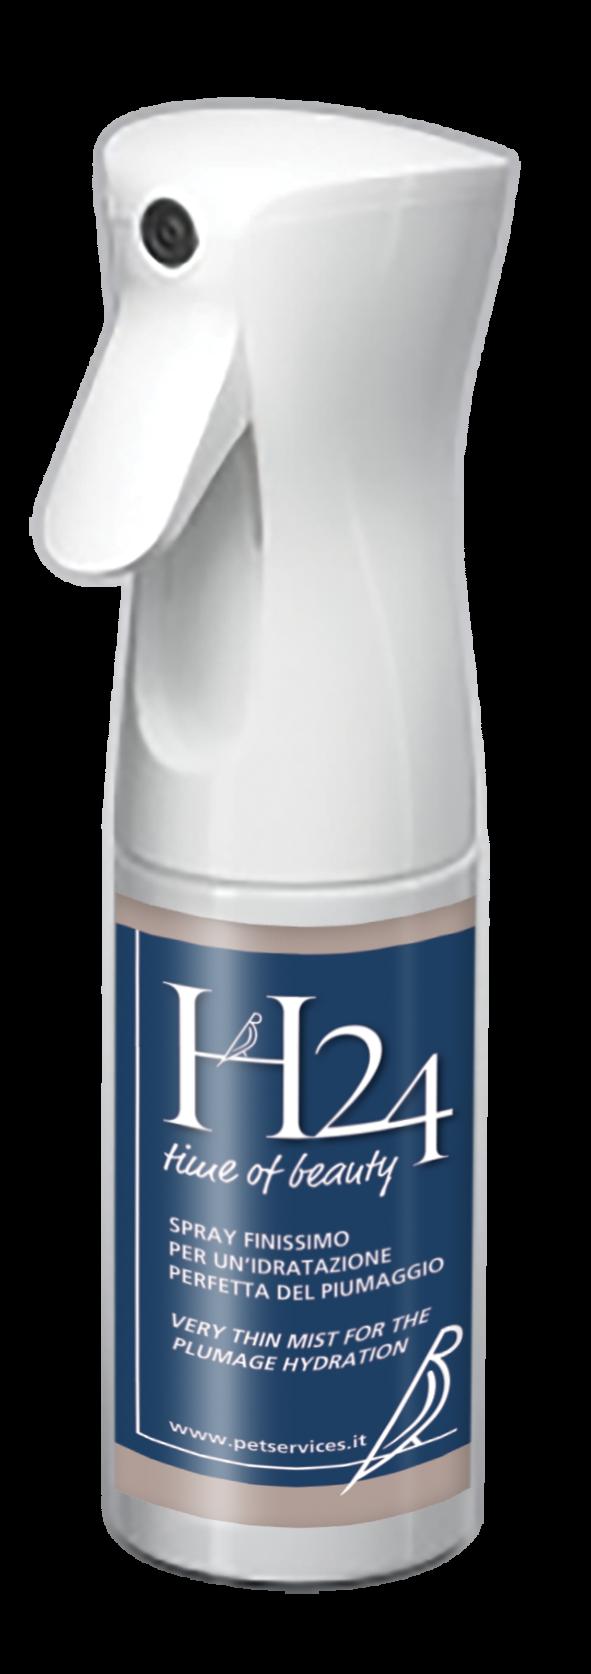 H24 Lege Spray Flacon